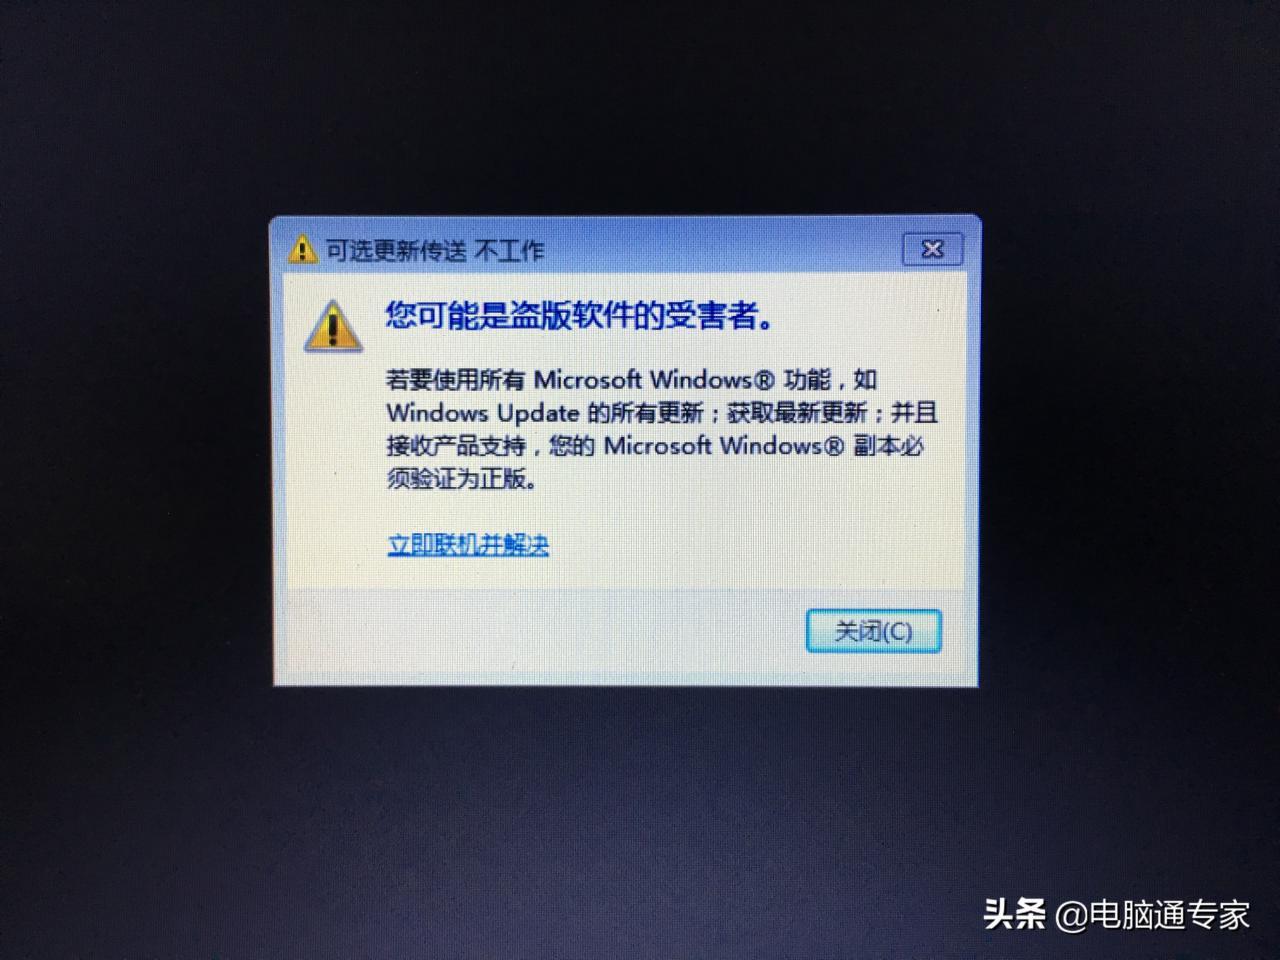 win出现您可能是盗版软件的受害者(教你一招解决)